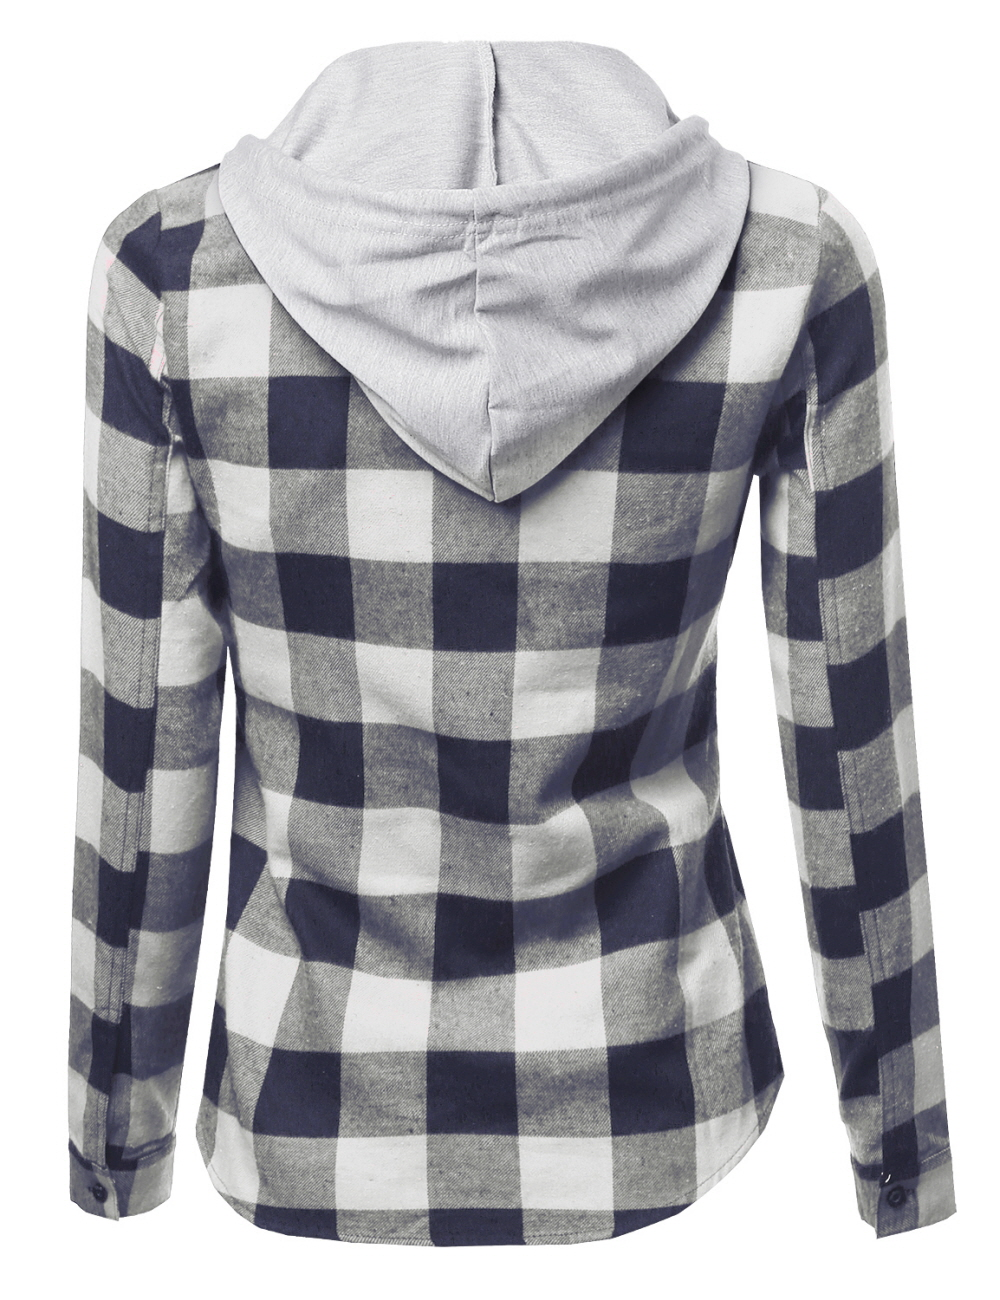 Fashionoutfit women 39 s casual soft plaid check detachable for Ladies soft flannel shirts